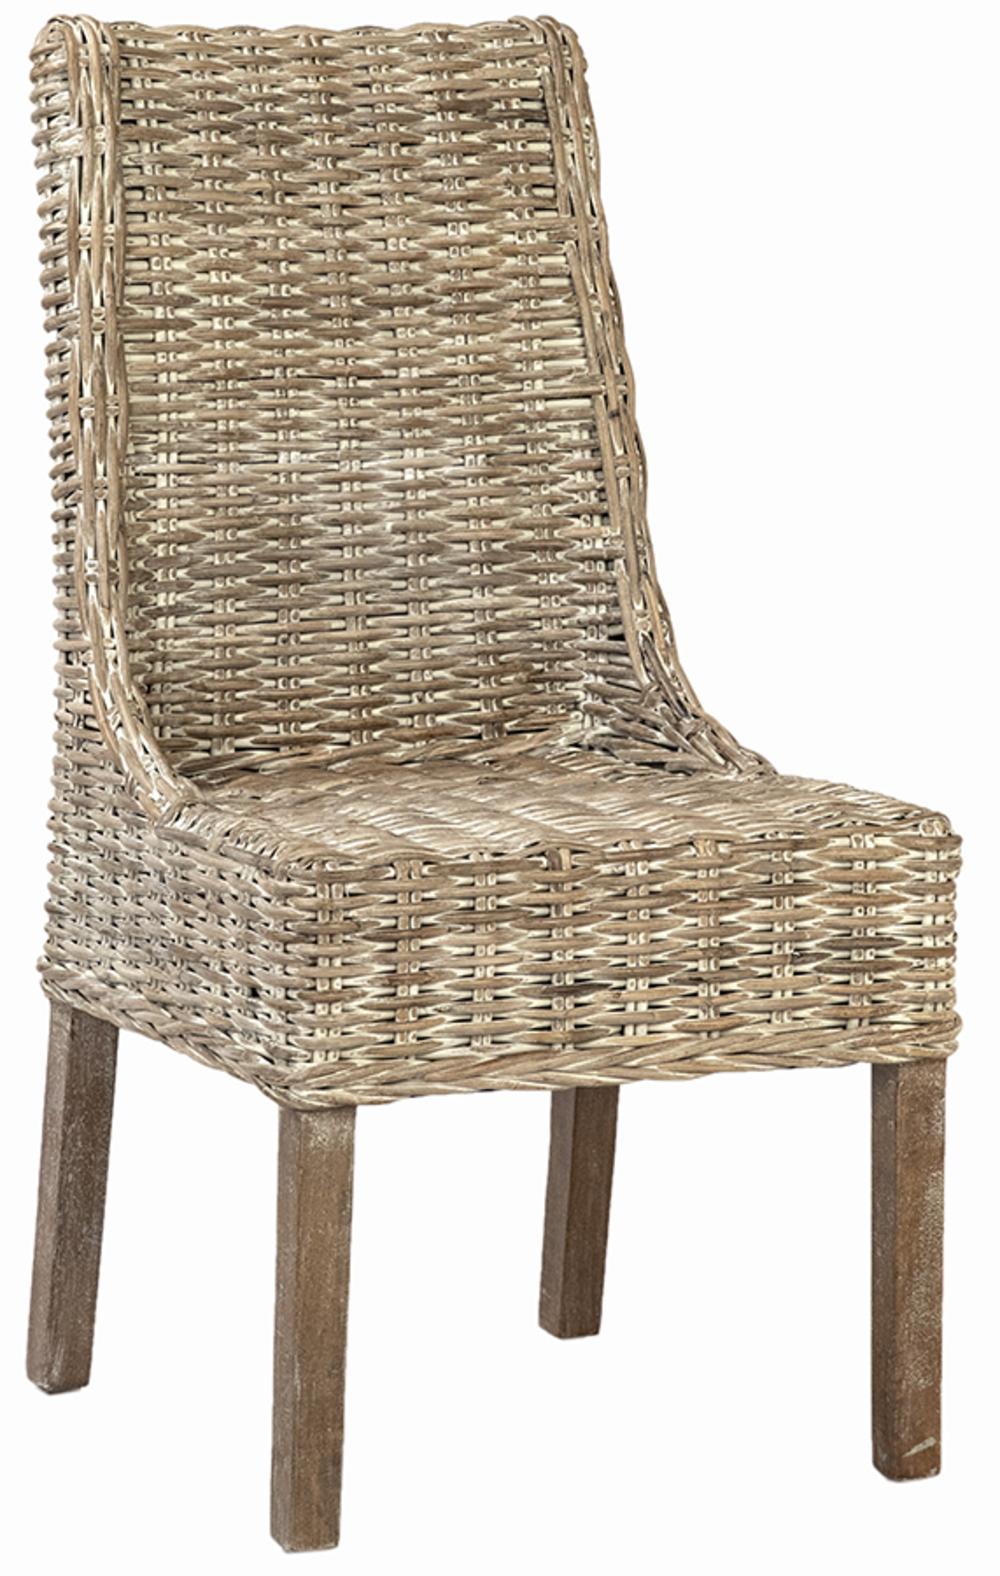 Dovetail Furniture - Ezio Dining Chair